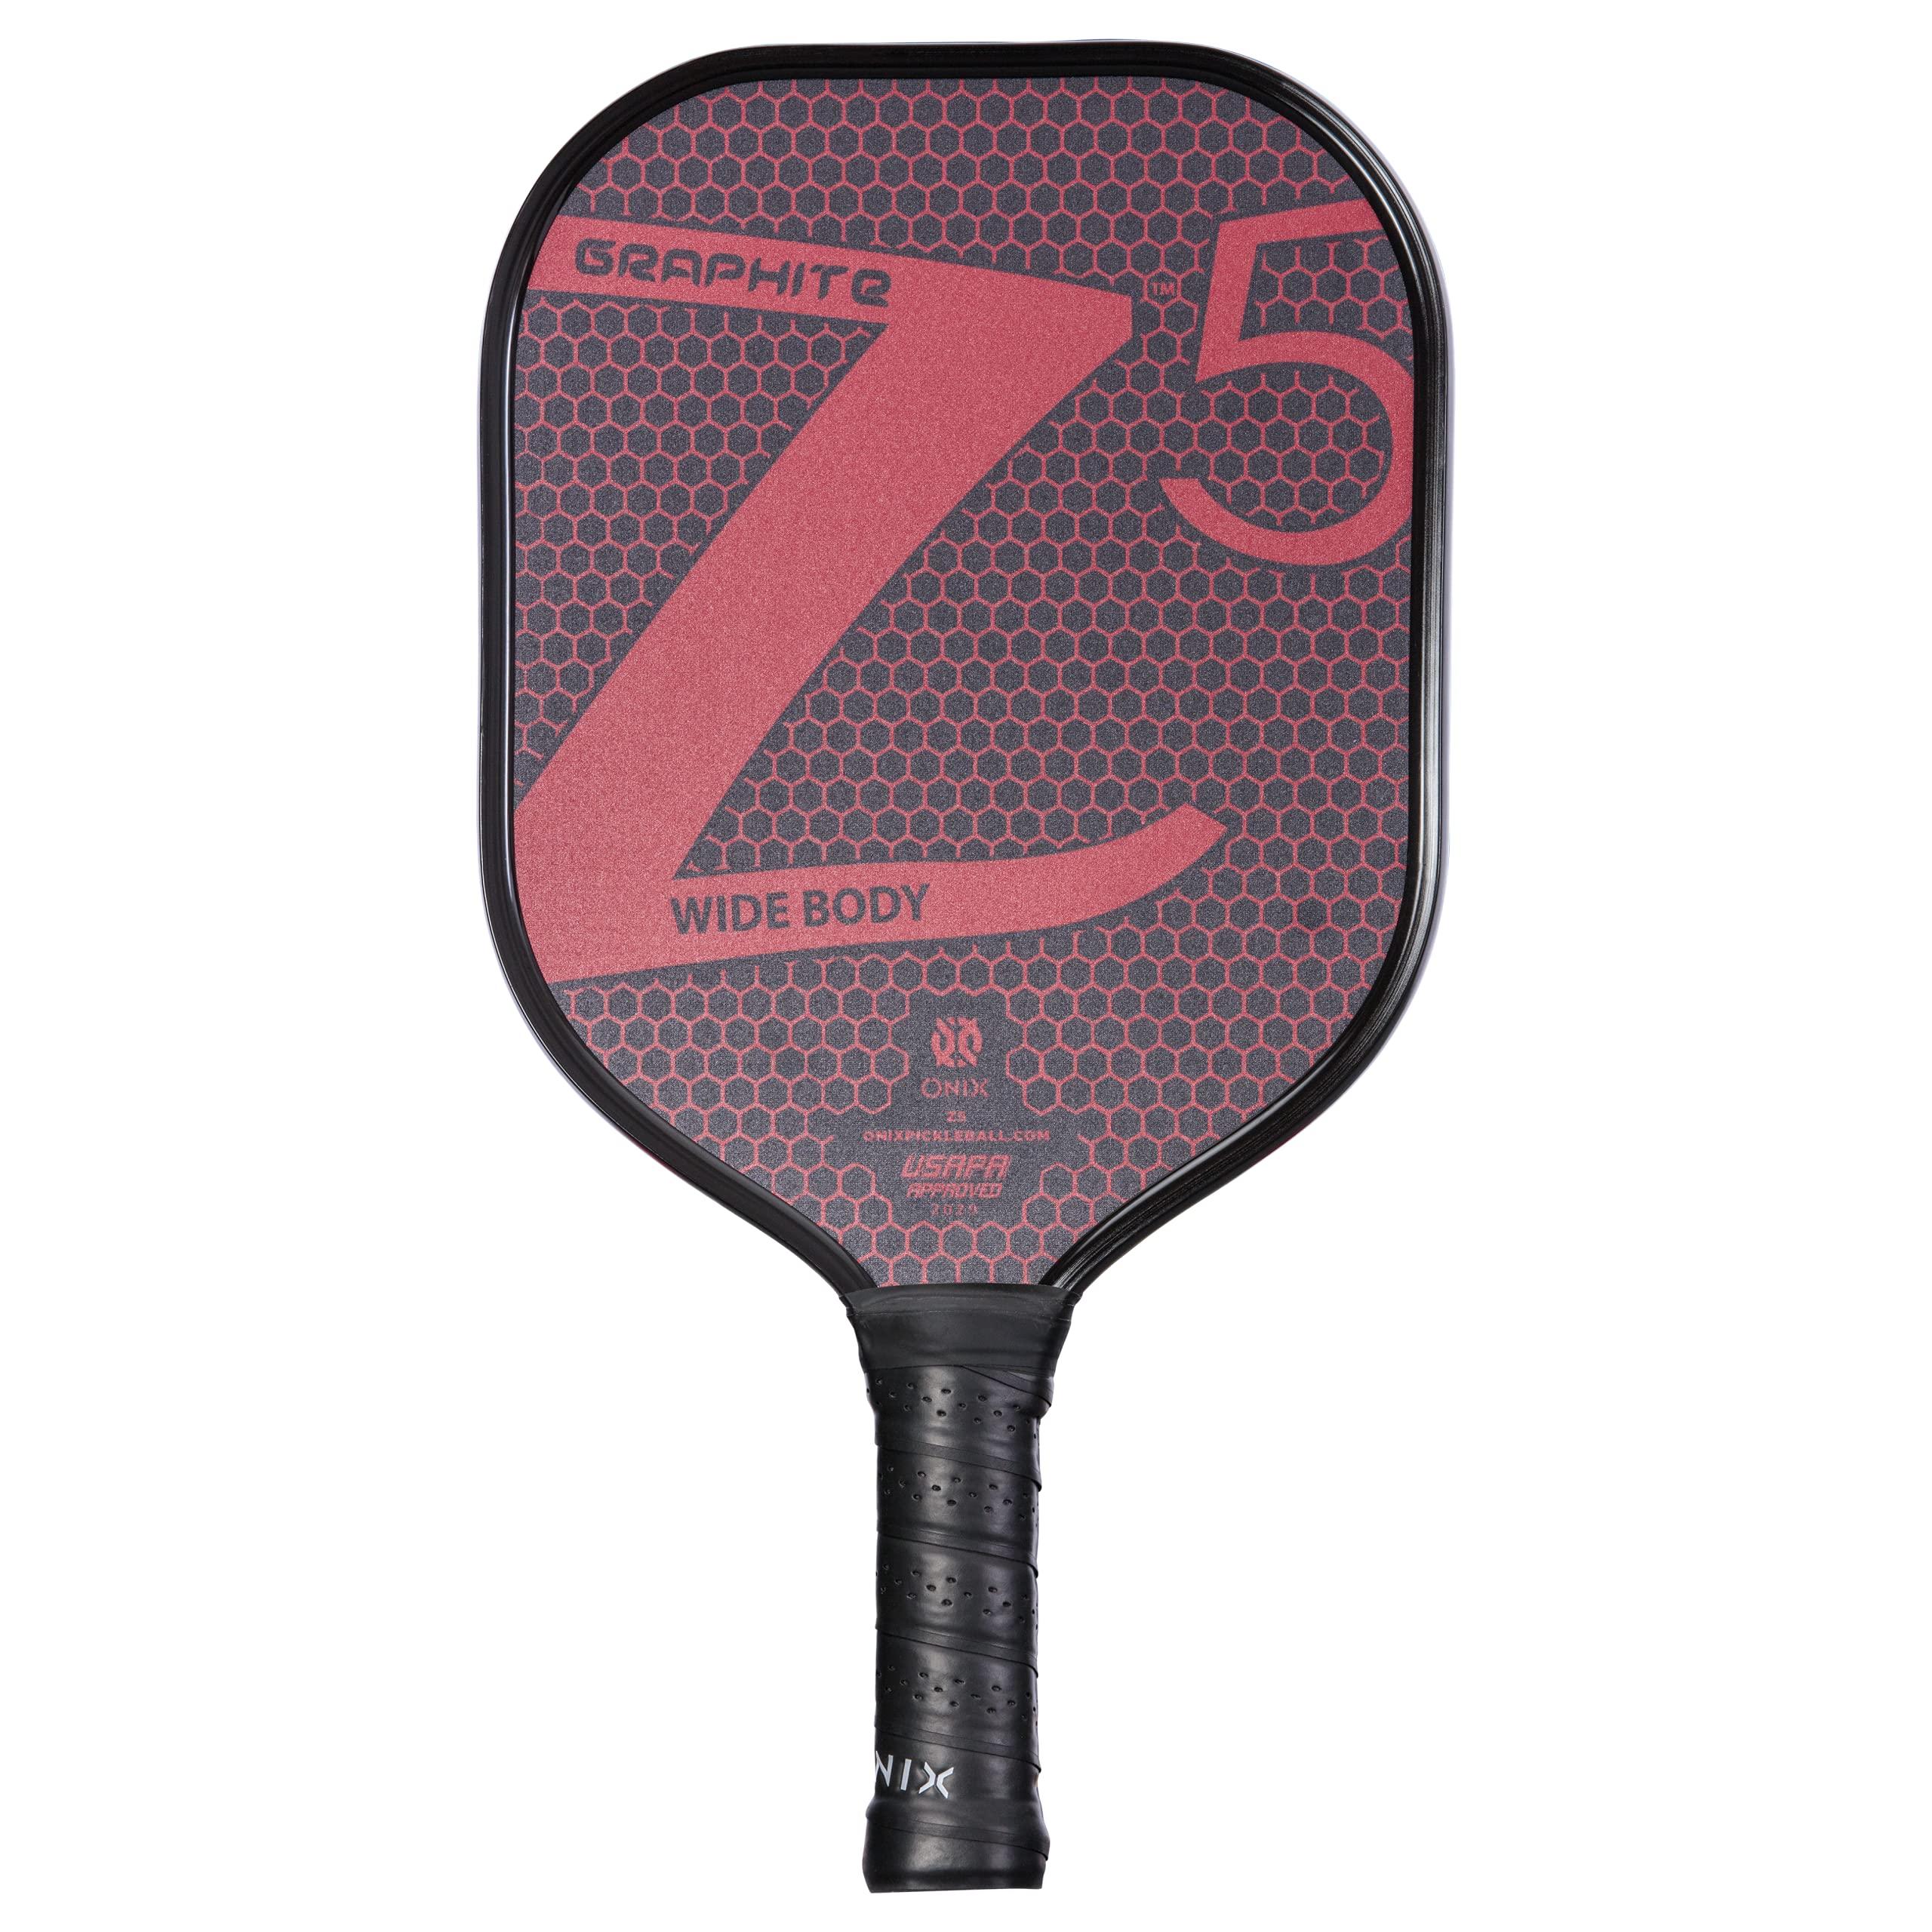 ONIX Graphite Z5 Graphite Carbon Fiber Pickleball Padd -VLQ3